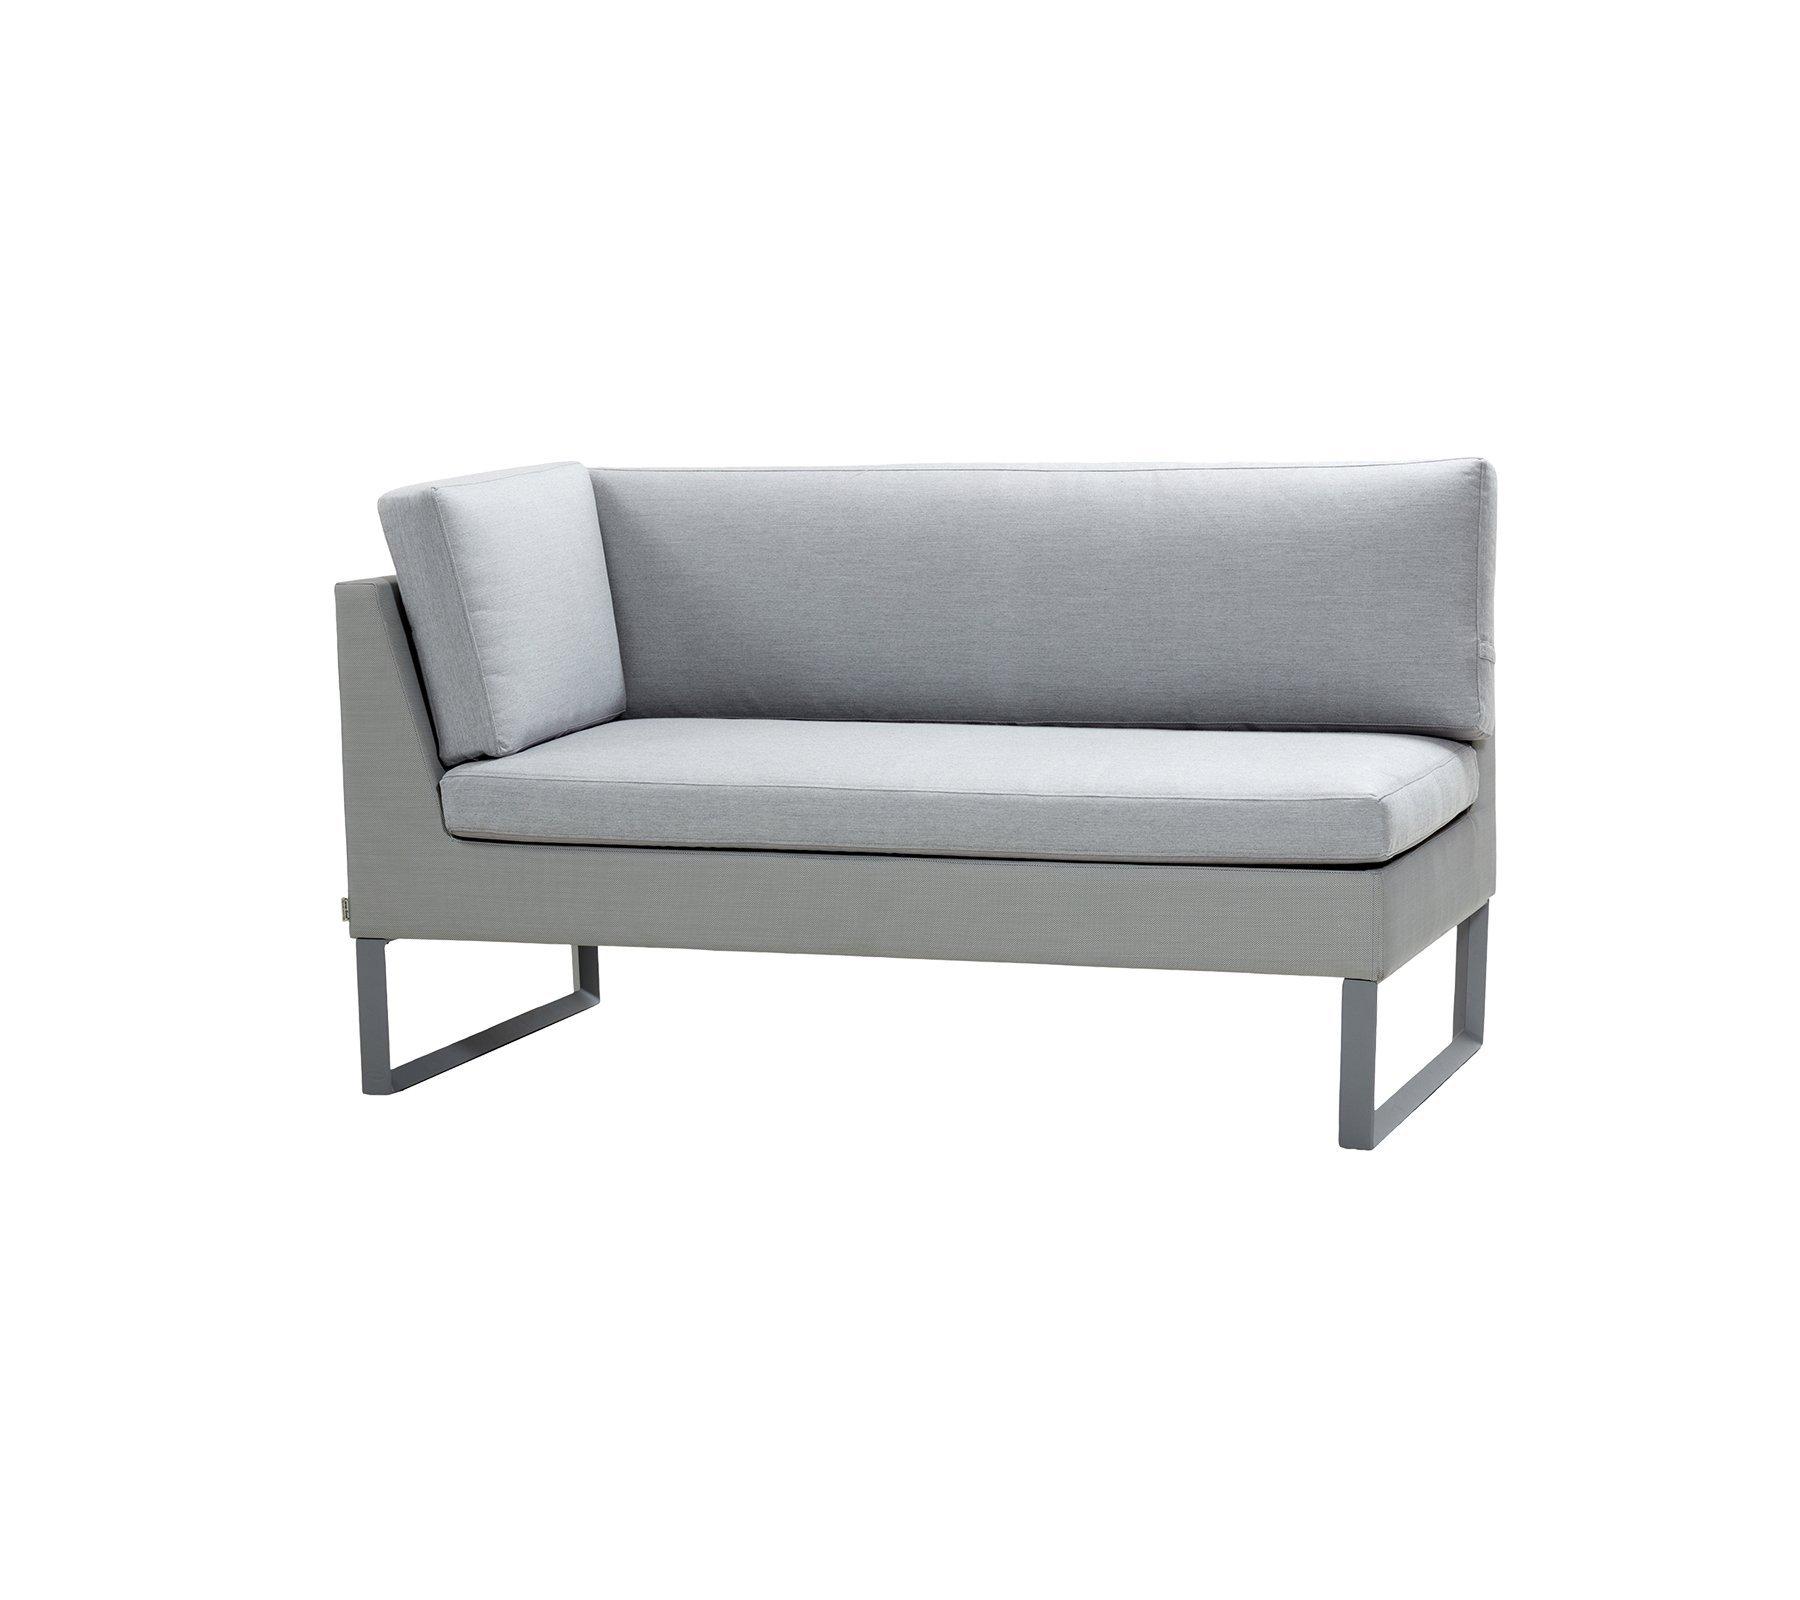 Flex 2 Seat Right Module Sofa modular from Cane-line